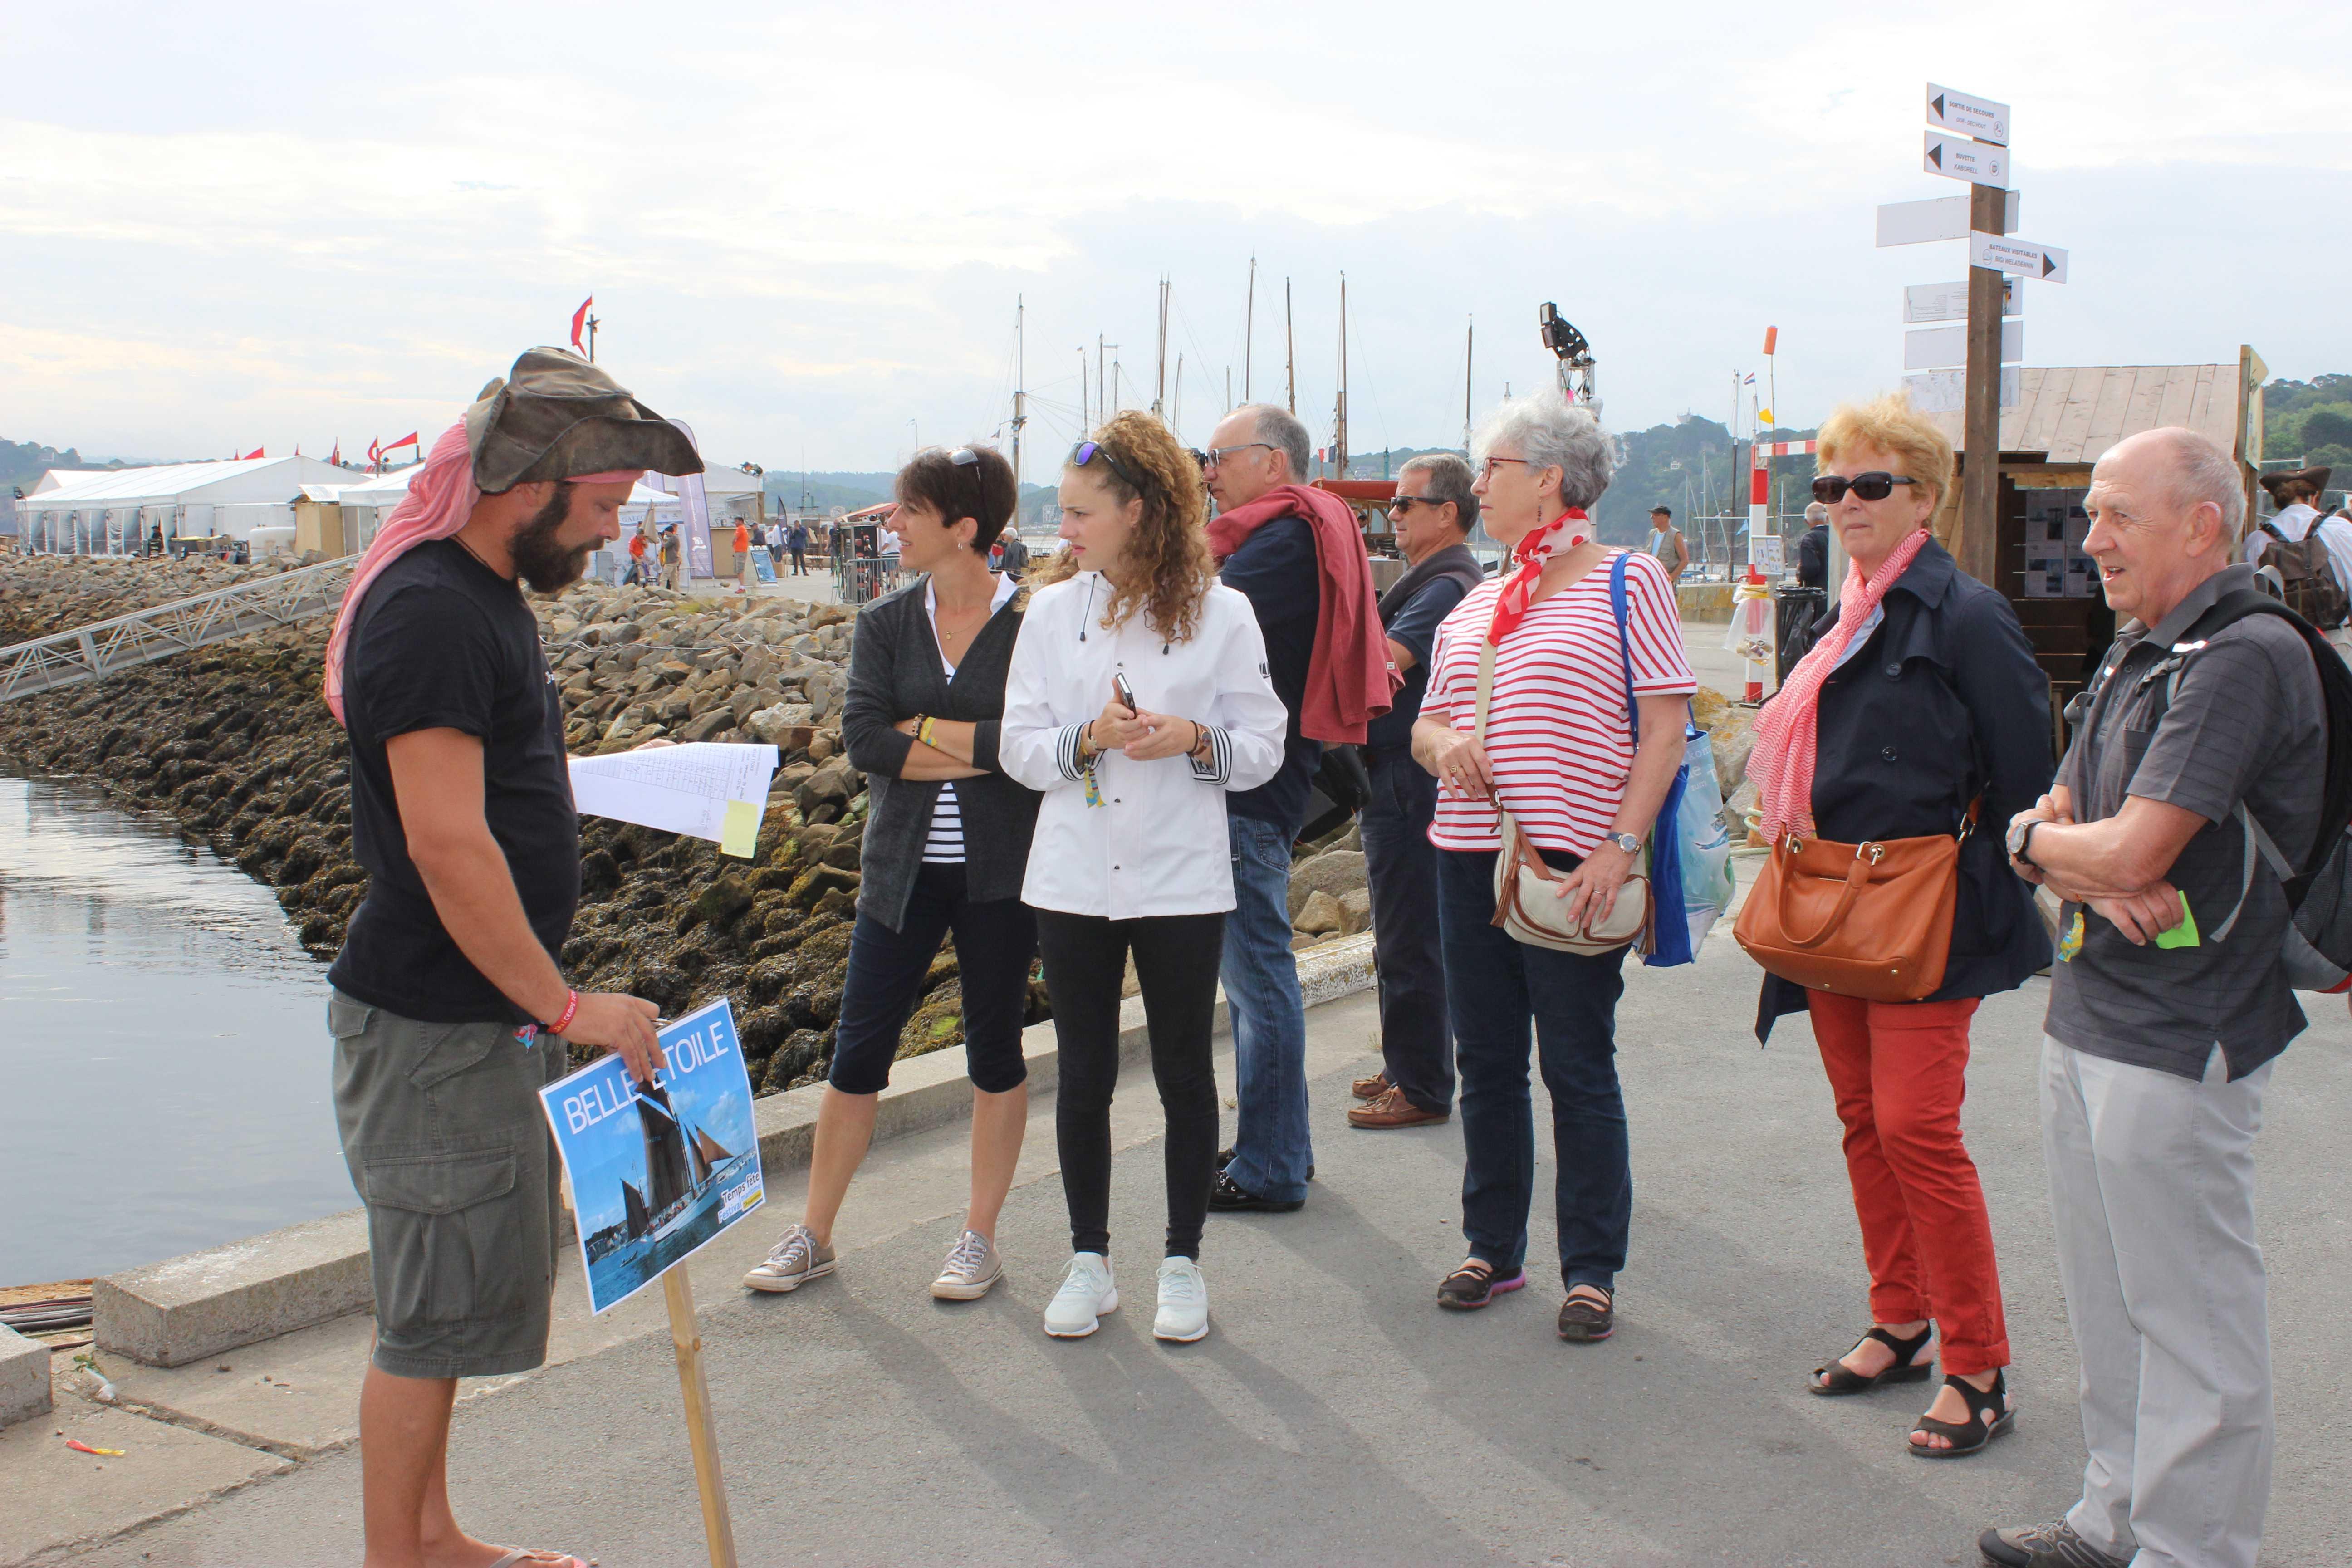 temps fête, festival maritime, sortie en mer, douarnenez